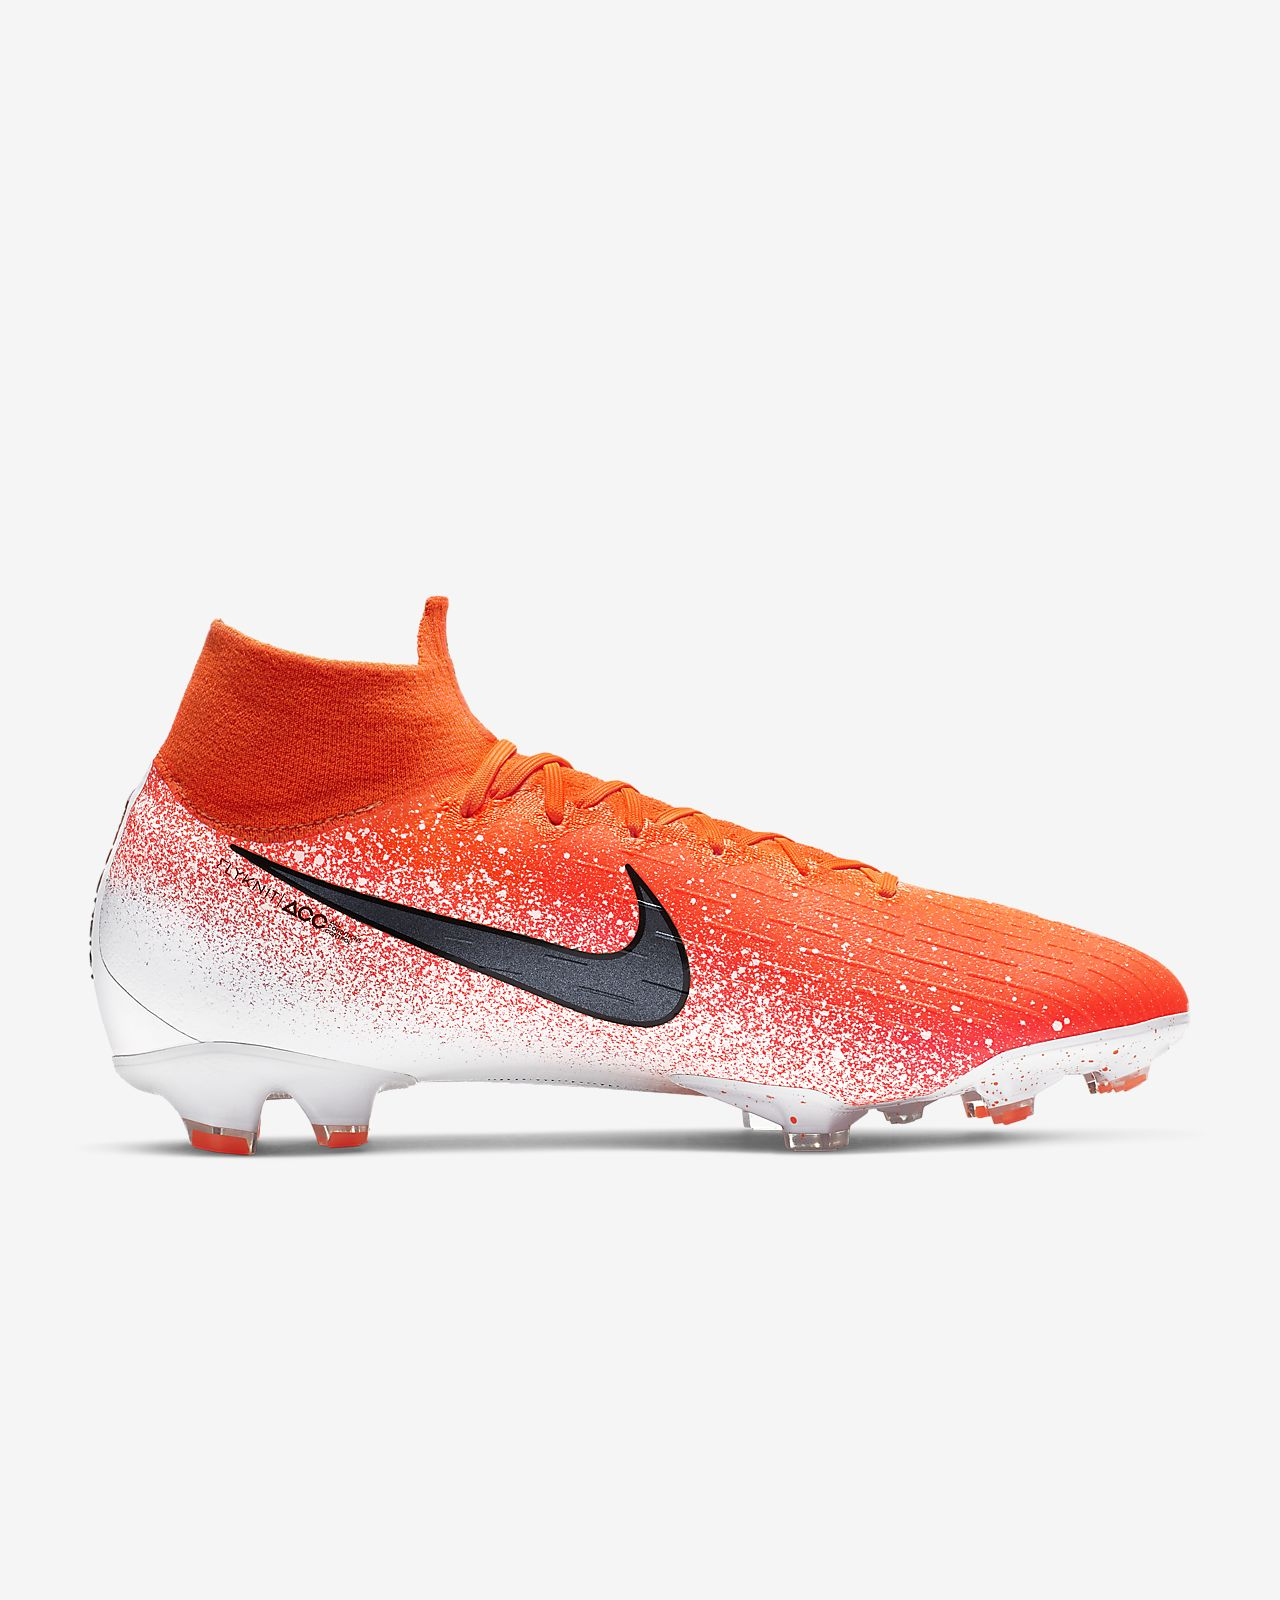 Alle Nike Fußballschuhe  Fit FG  Farbe Fußballschuhe Orange